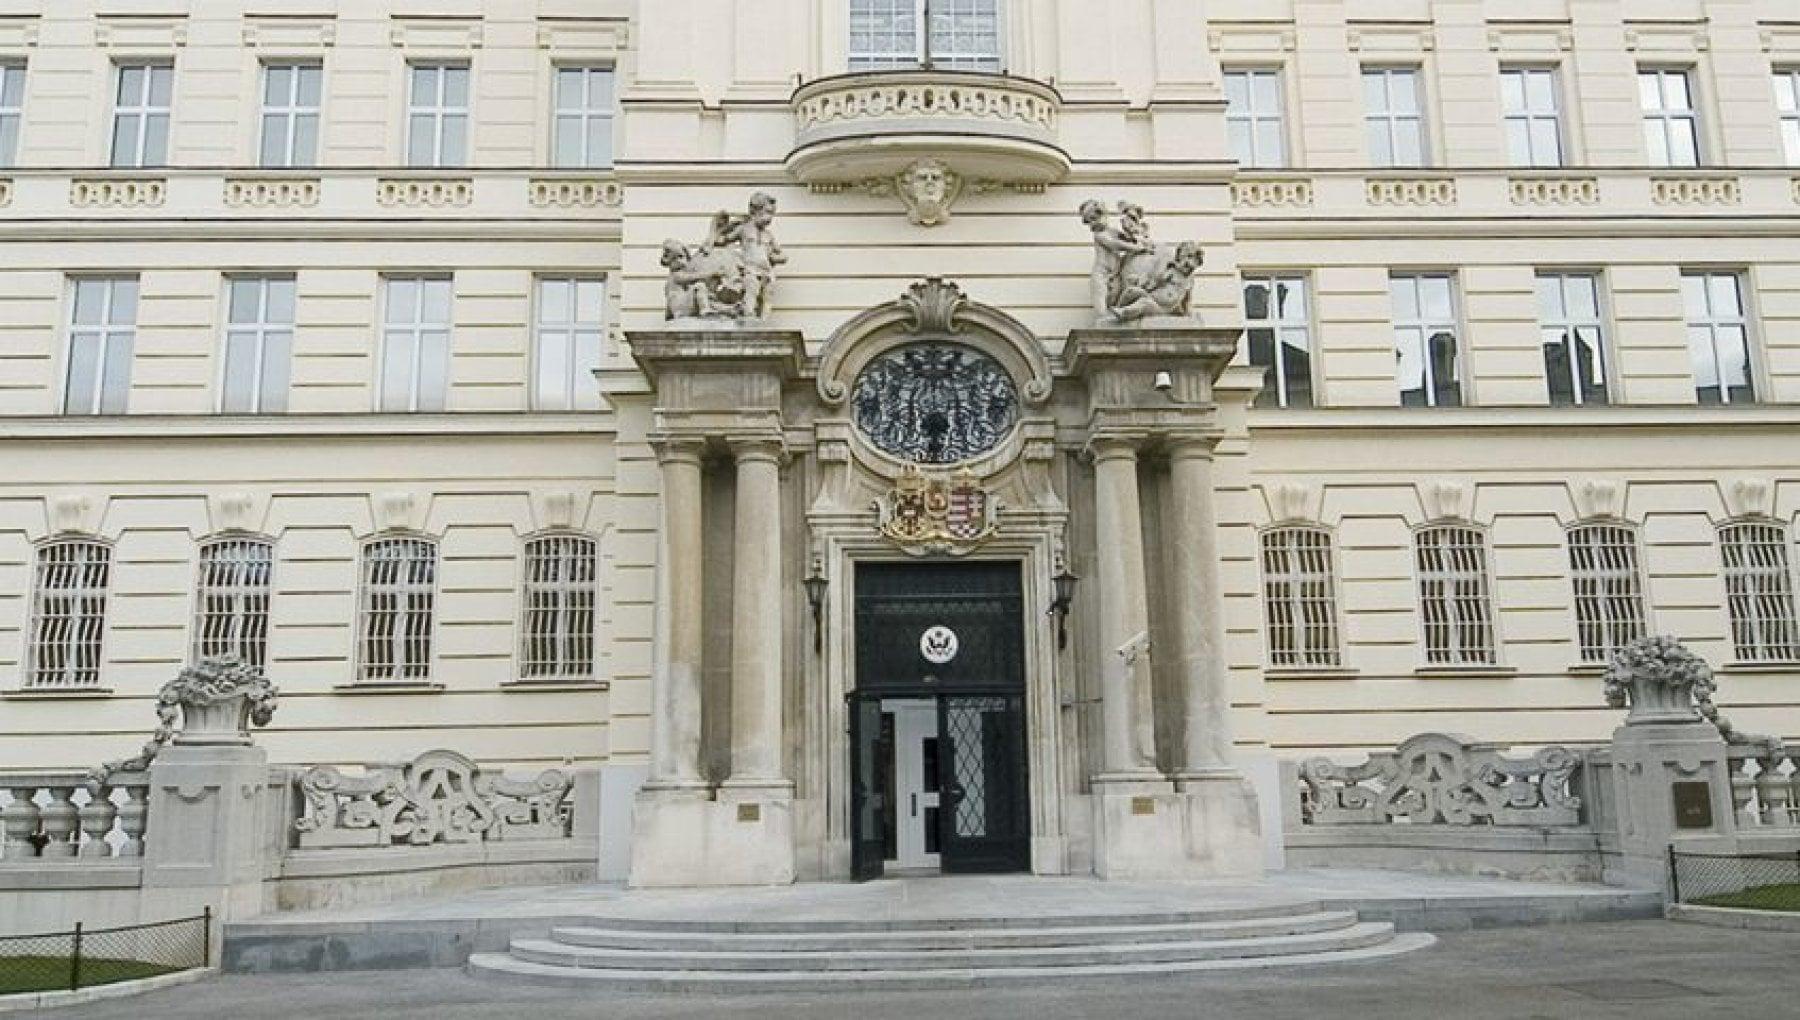 184646628 7d464250 f857 45b6 890b e5437ccf4975 - Austria, la sindrome cubana dei diplomatici Usa